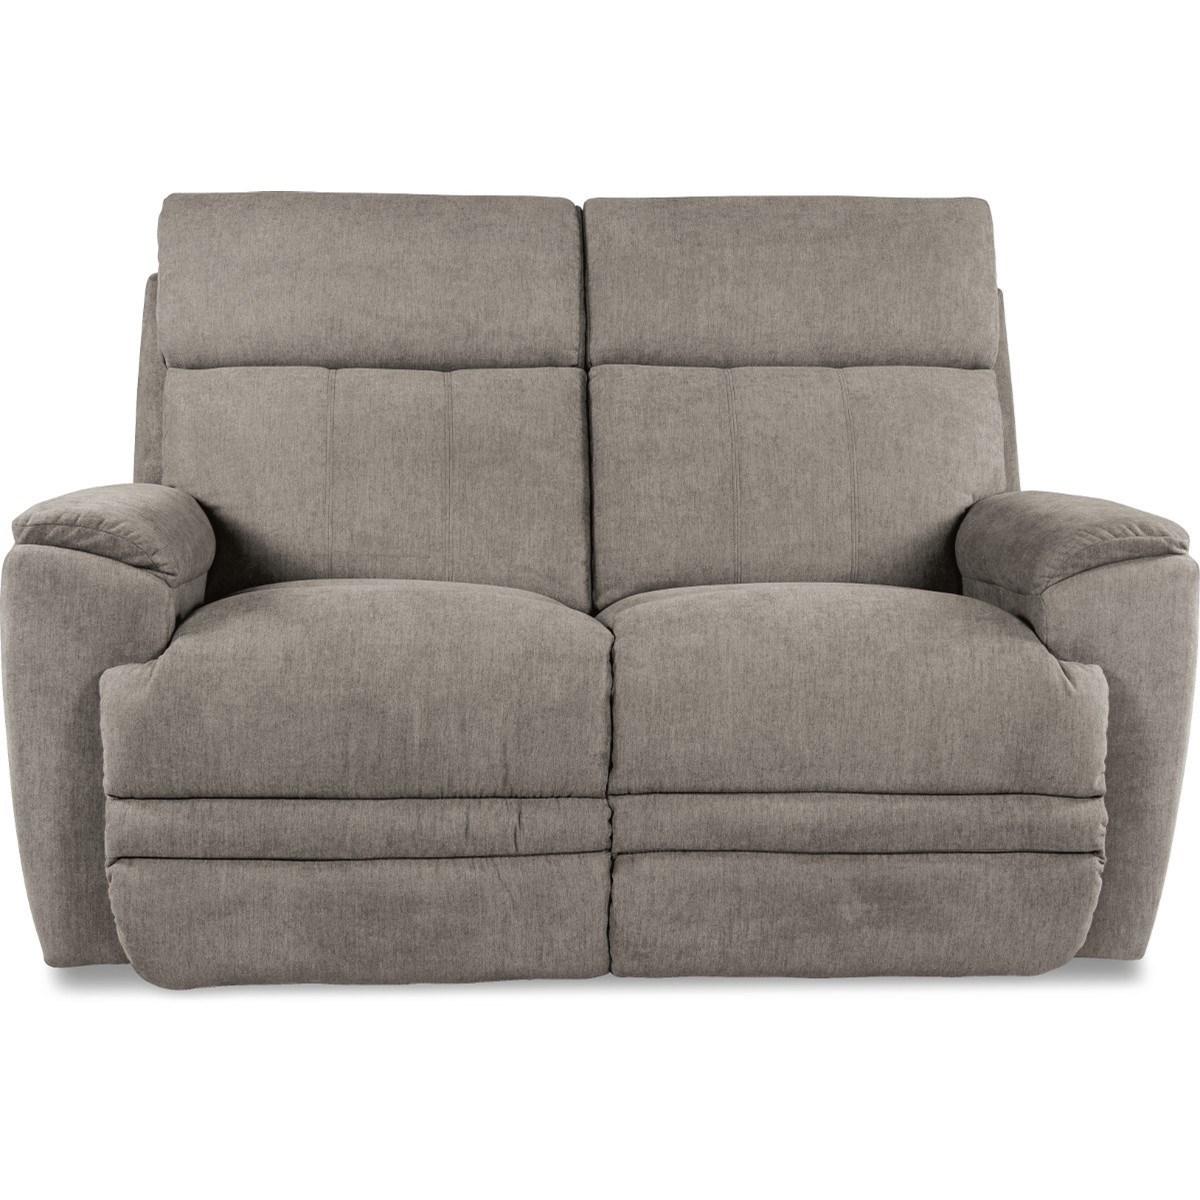 Talladega PowerRecline Loveseat w/ Pwr Headrests by La-Z-Boy at HomeWorld Furniture